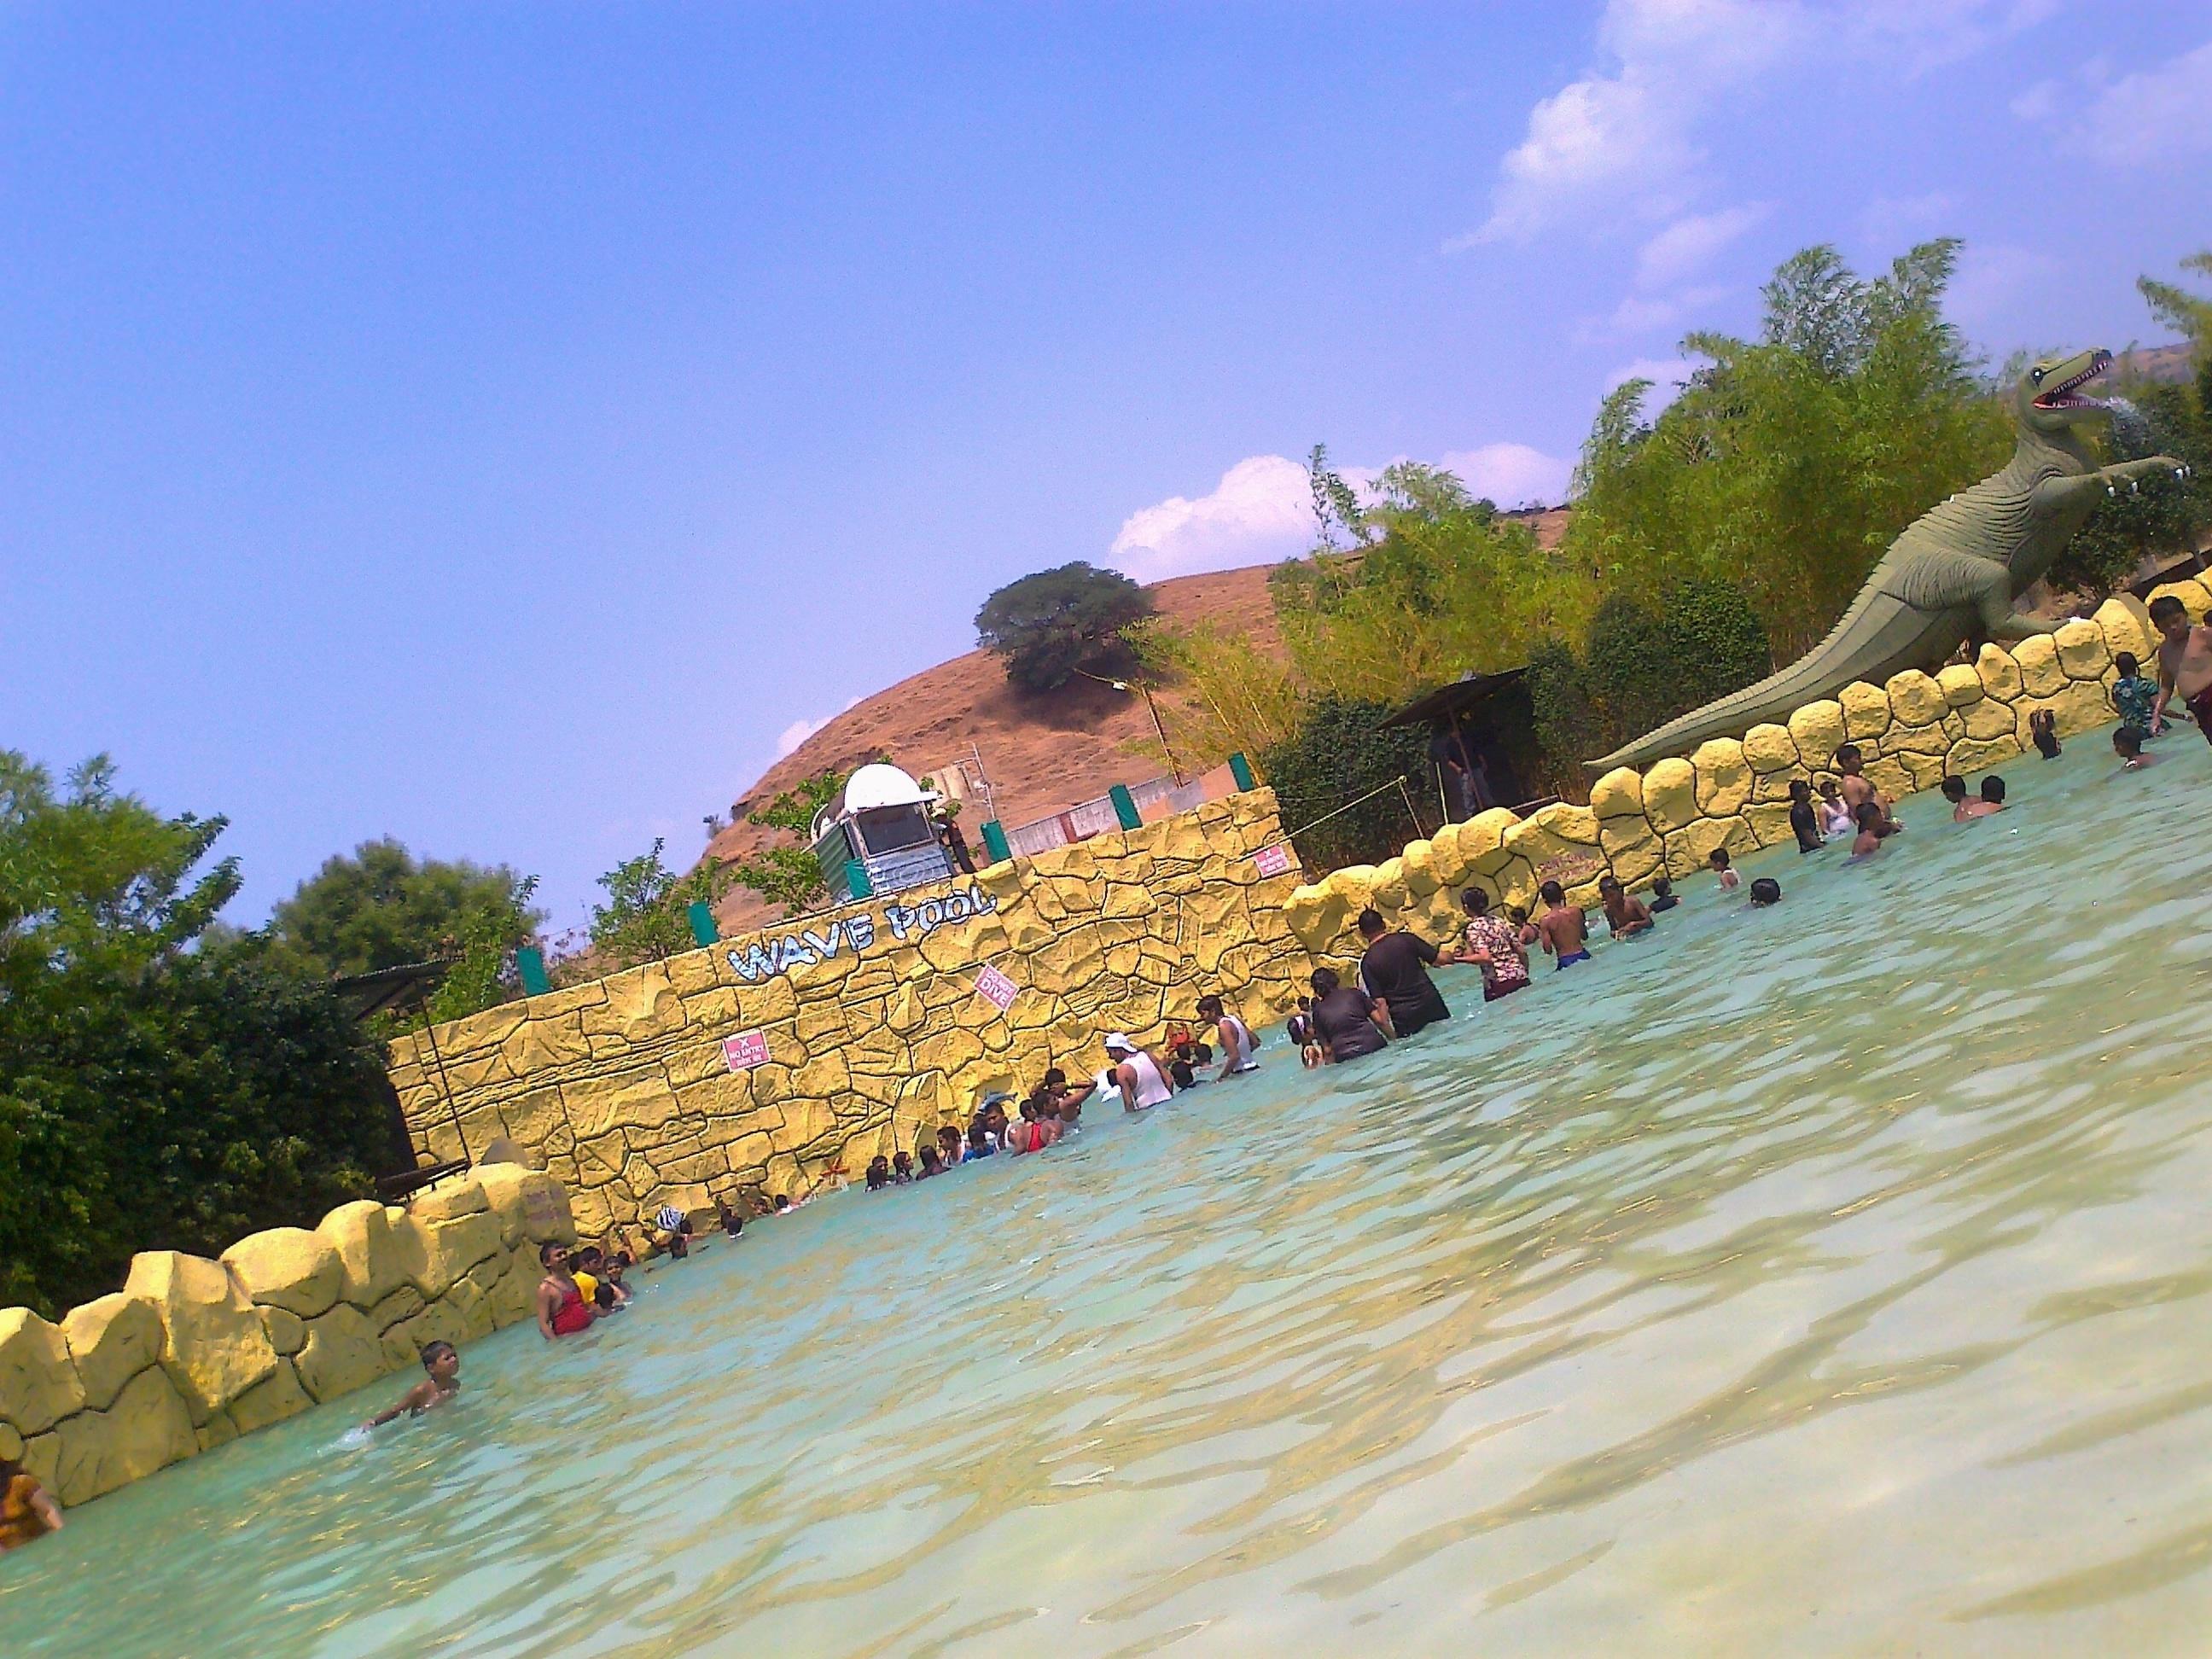 Krushnai Water Park: waterparks in Pune